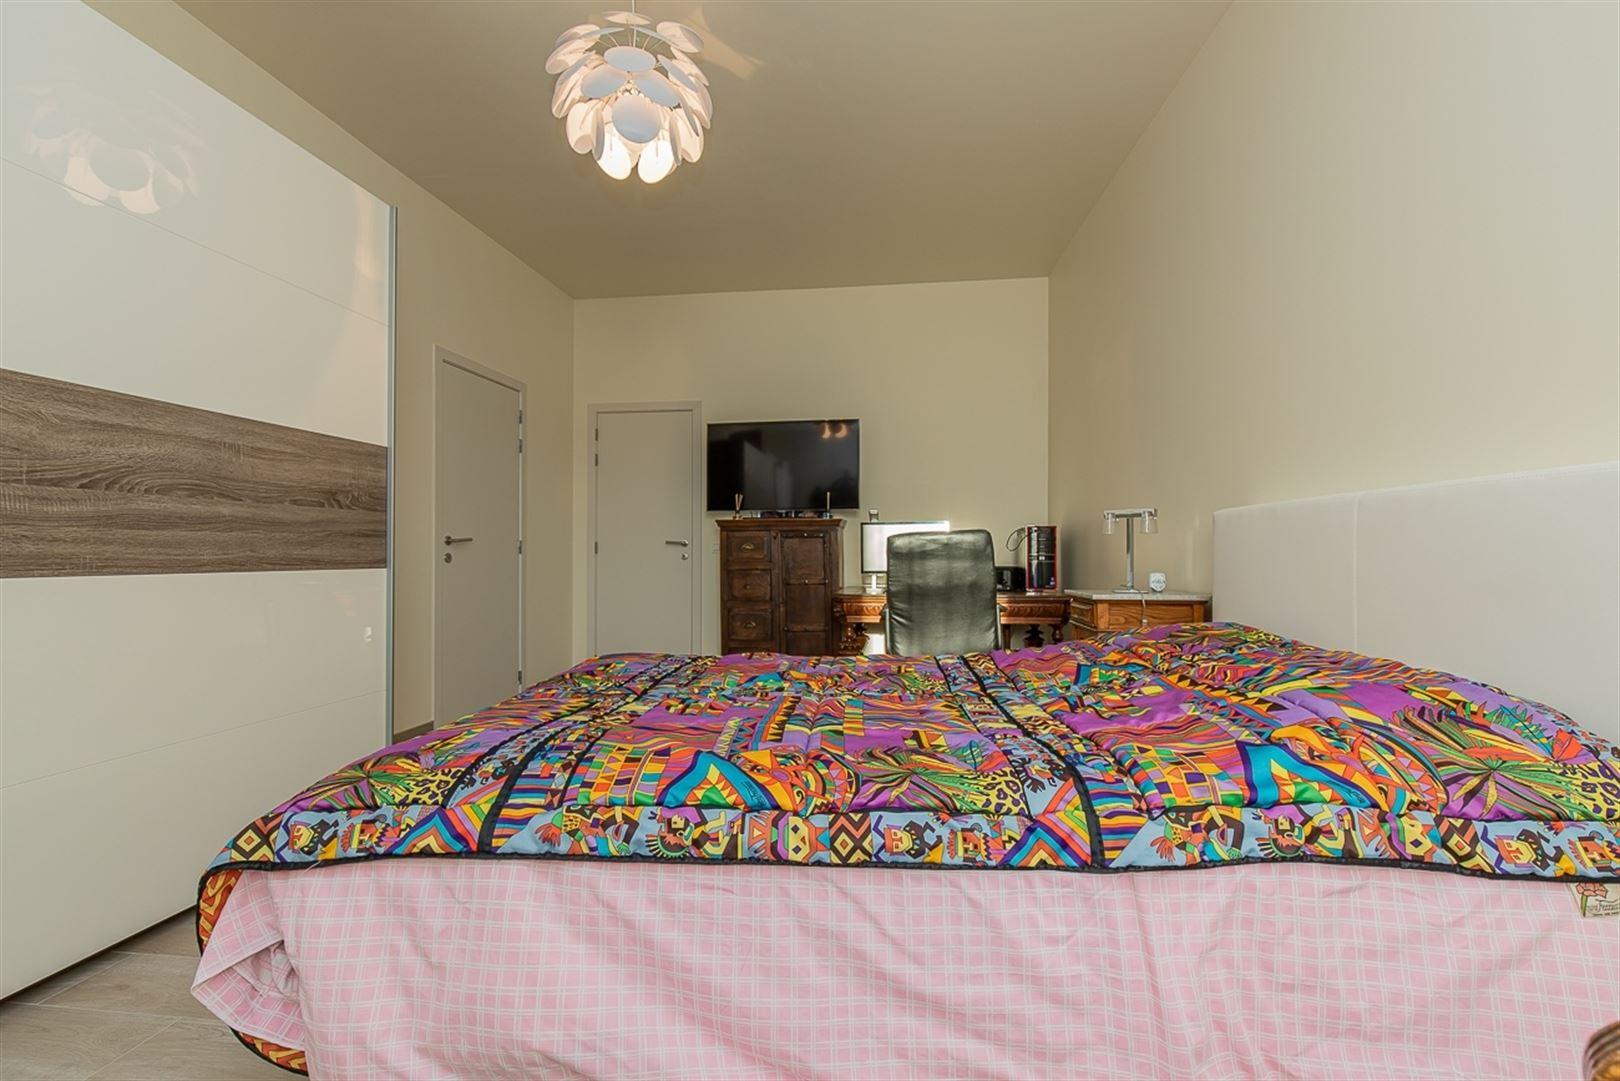 Foto 11 : Duplex/Penthouse te 9200 DENDERMONDE (België) - Prijs € 399.000